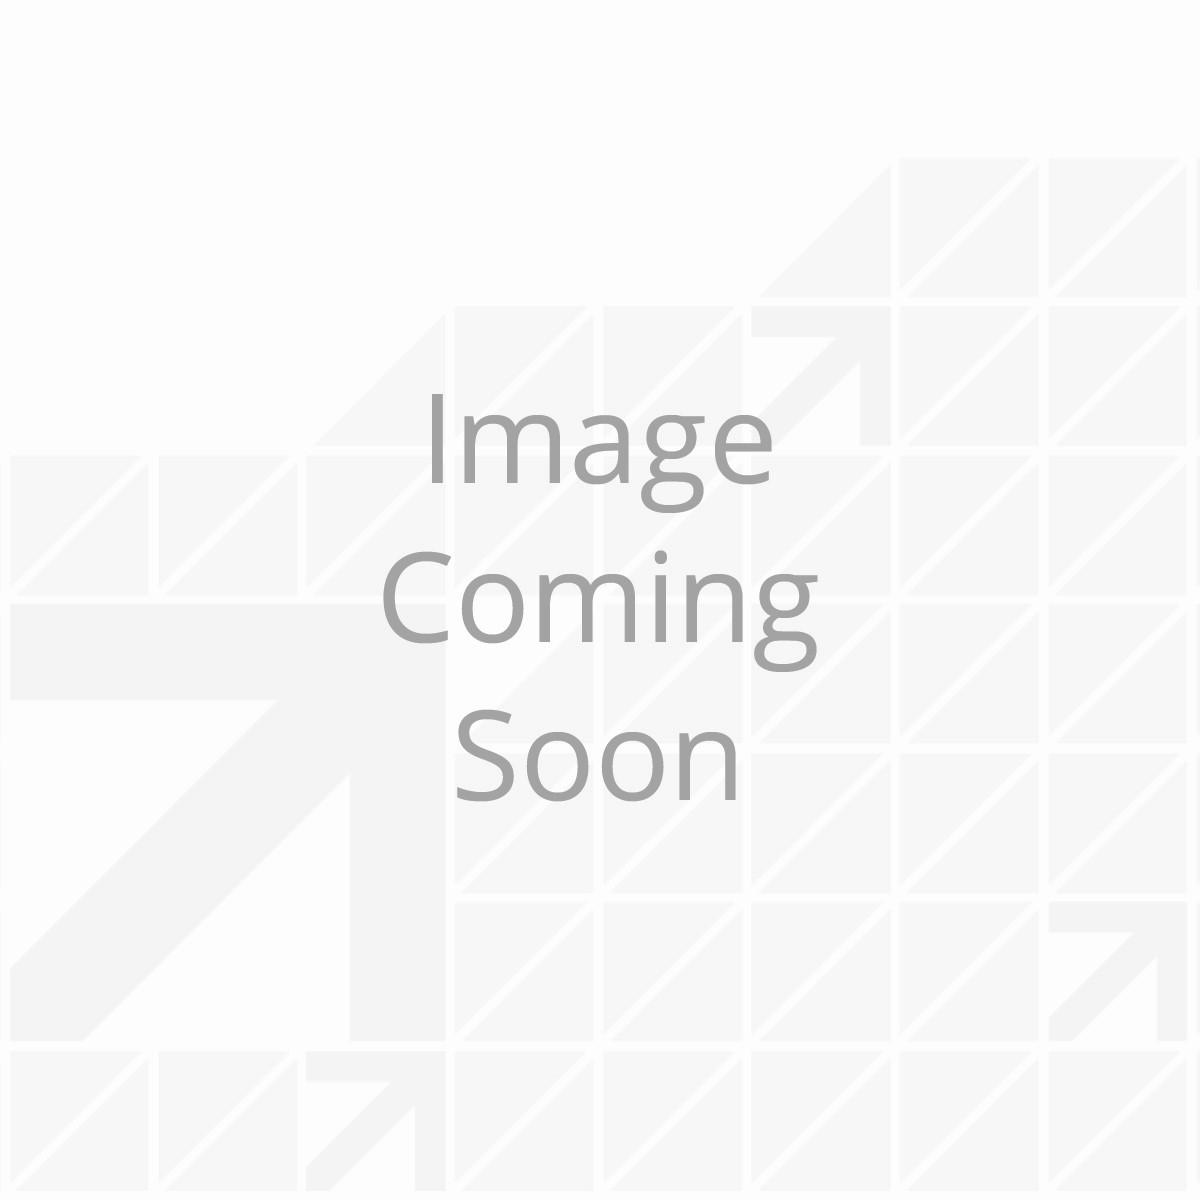 Slimrack Coupling Motor Square Shaft Drive 3010002381